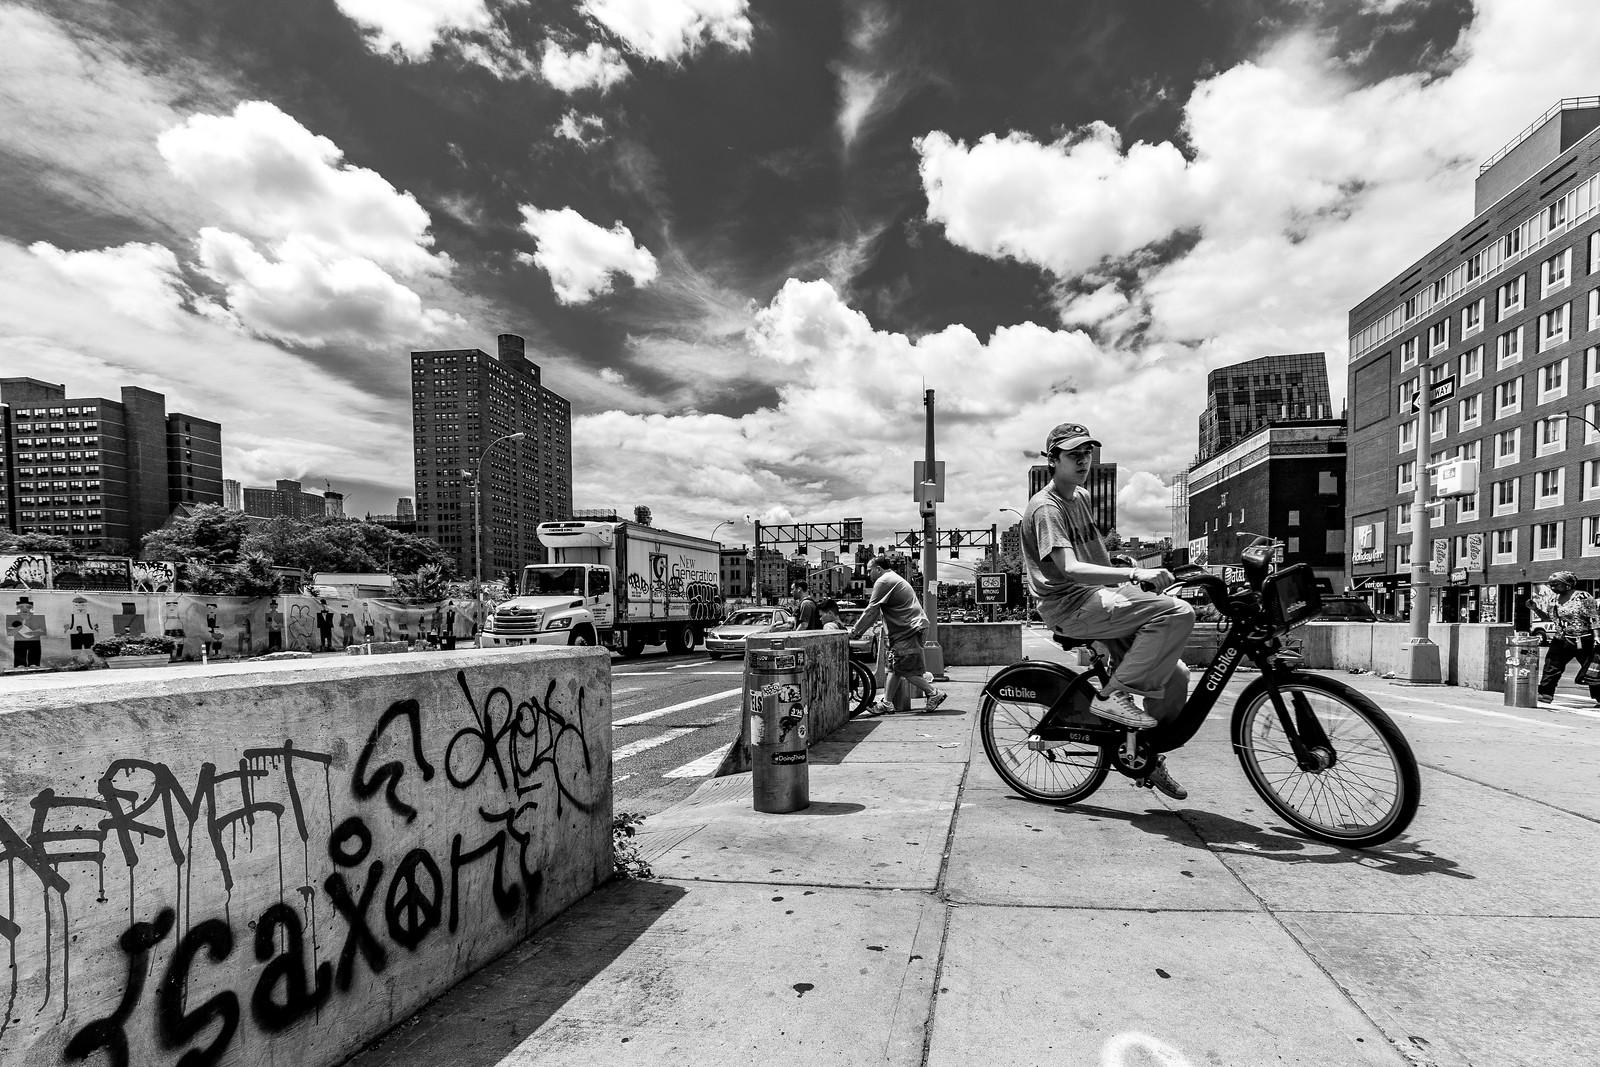 Lower East Side - Manhattan - NYC